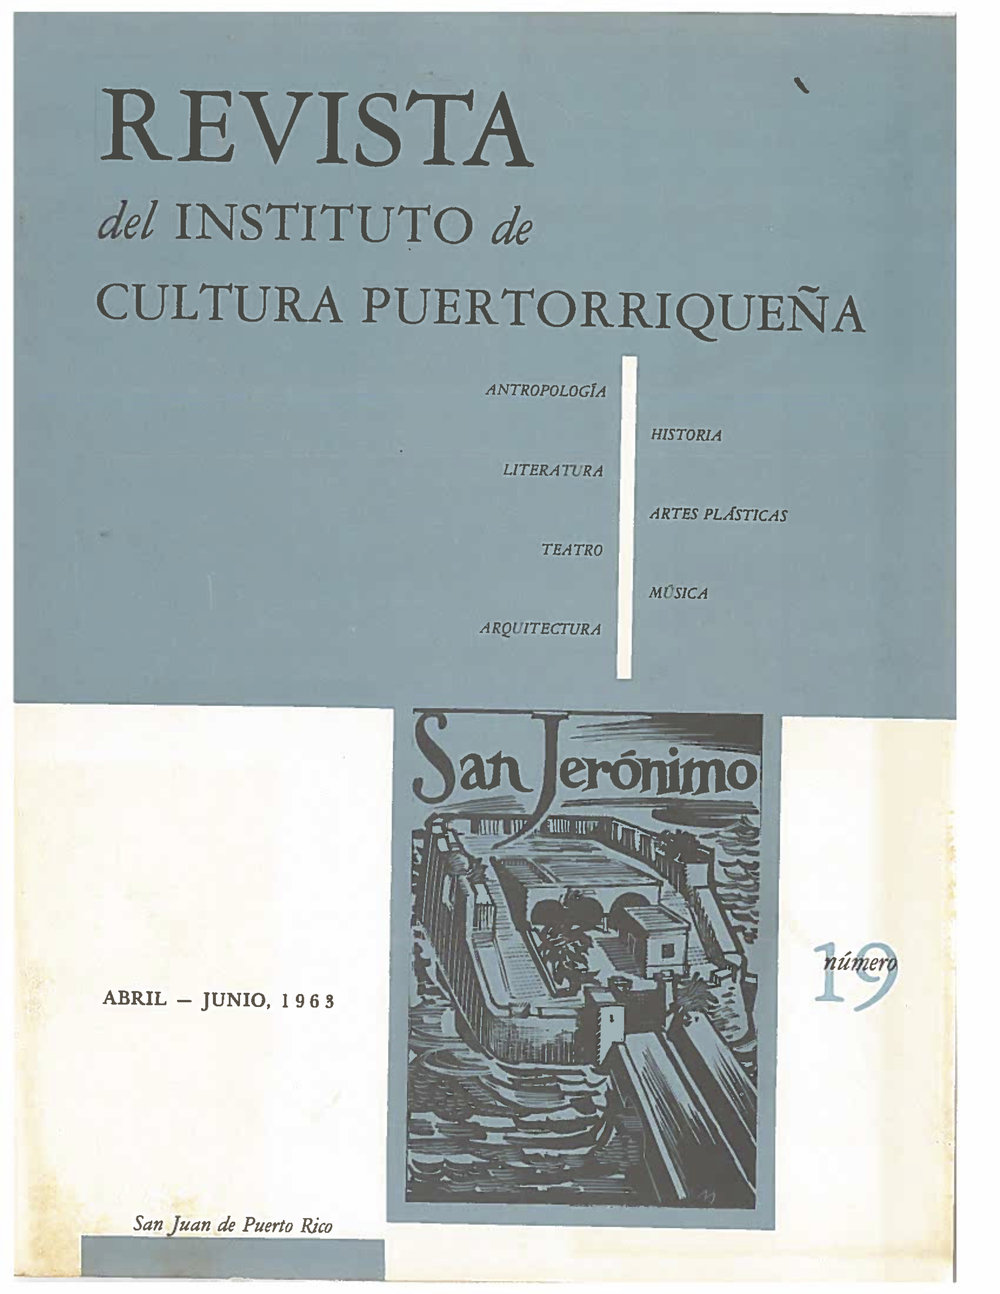 Número 19 / 1963